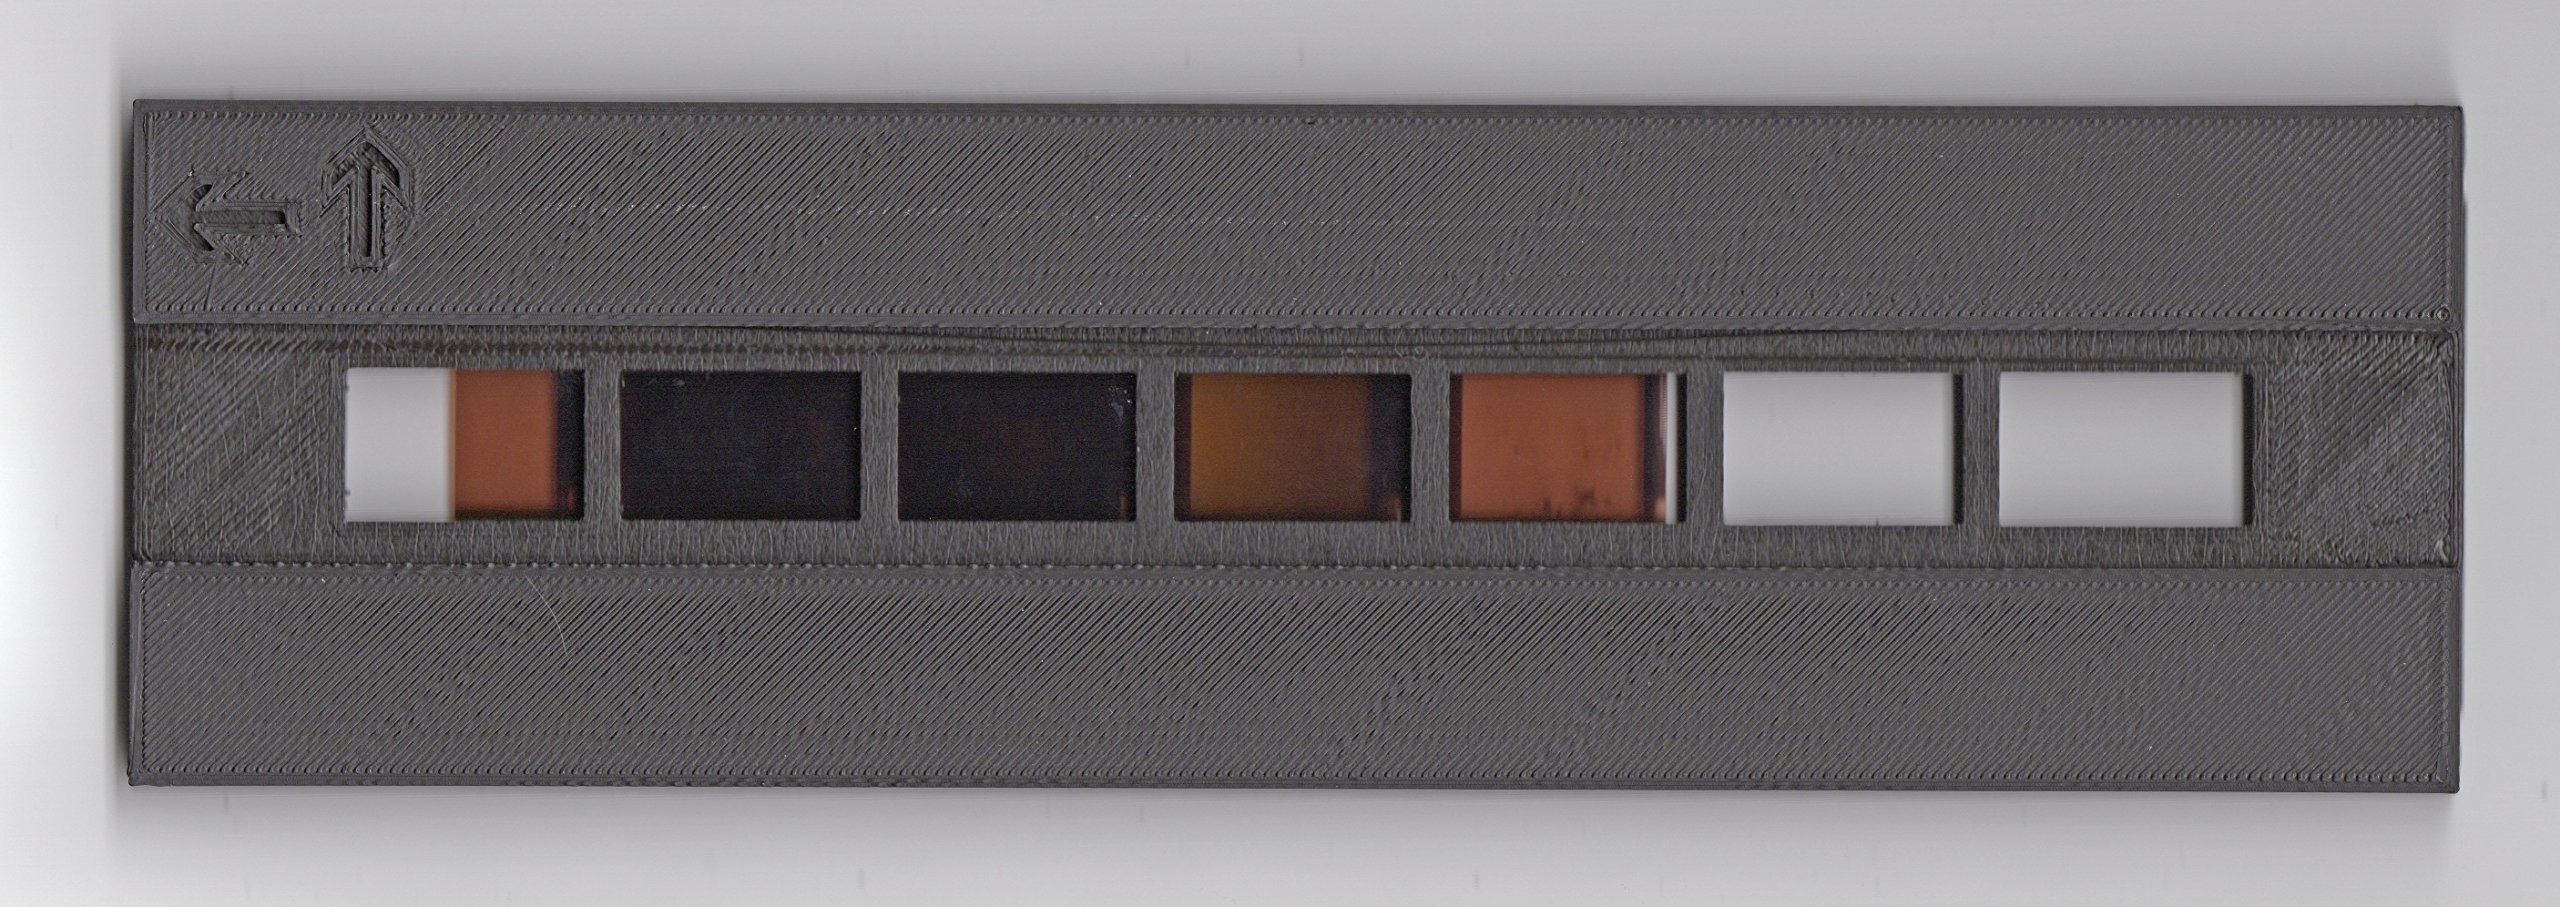 110 film adapter for Jumbl 22MP Film Scanner